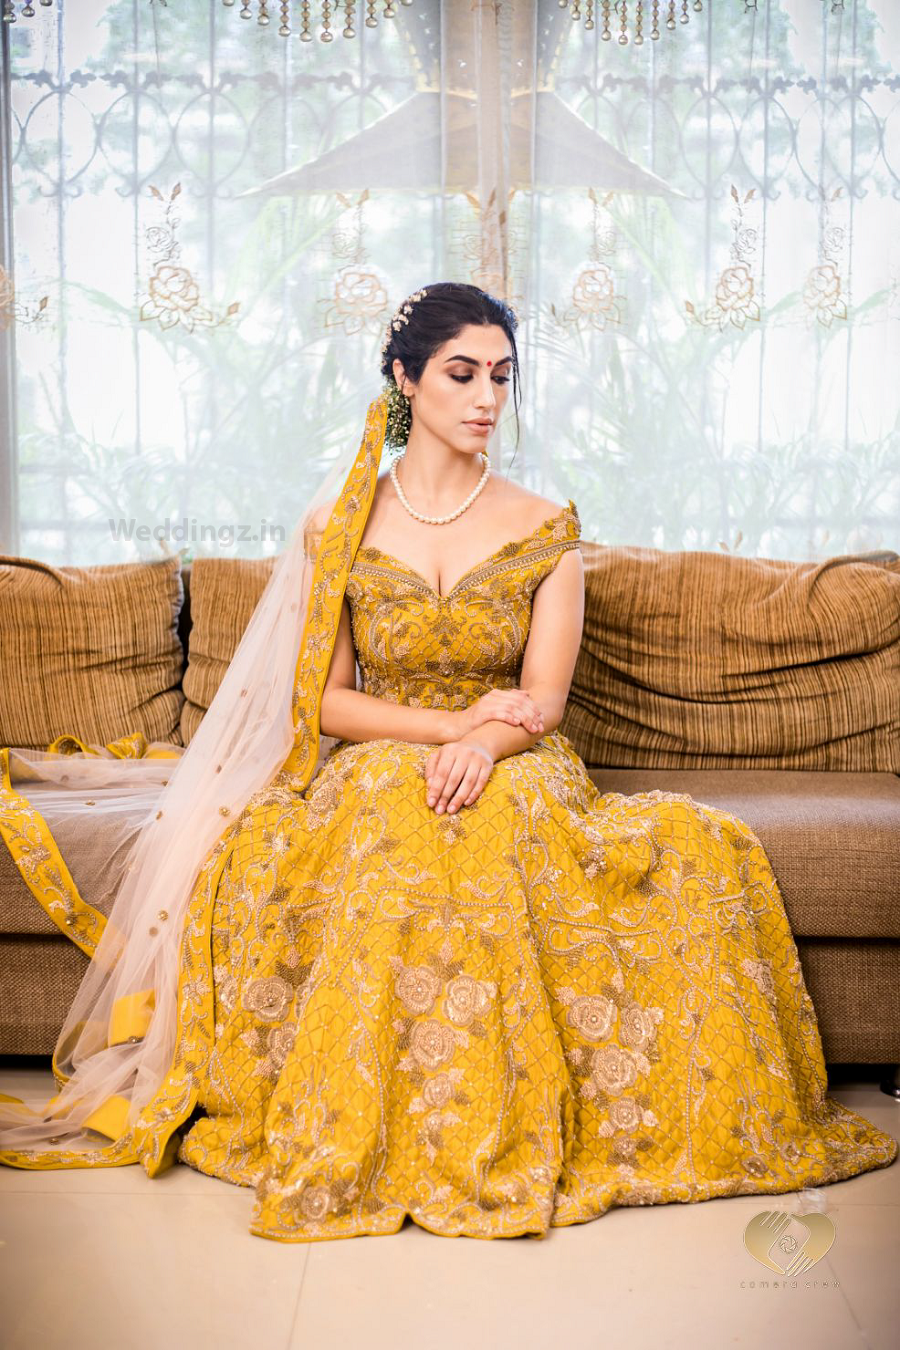 How to recreate Kareena Kapoor's Bridal Look from Veere Di ...